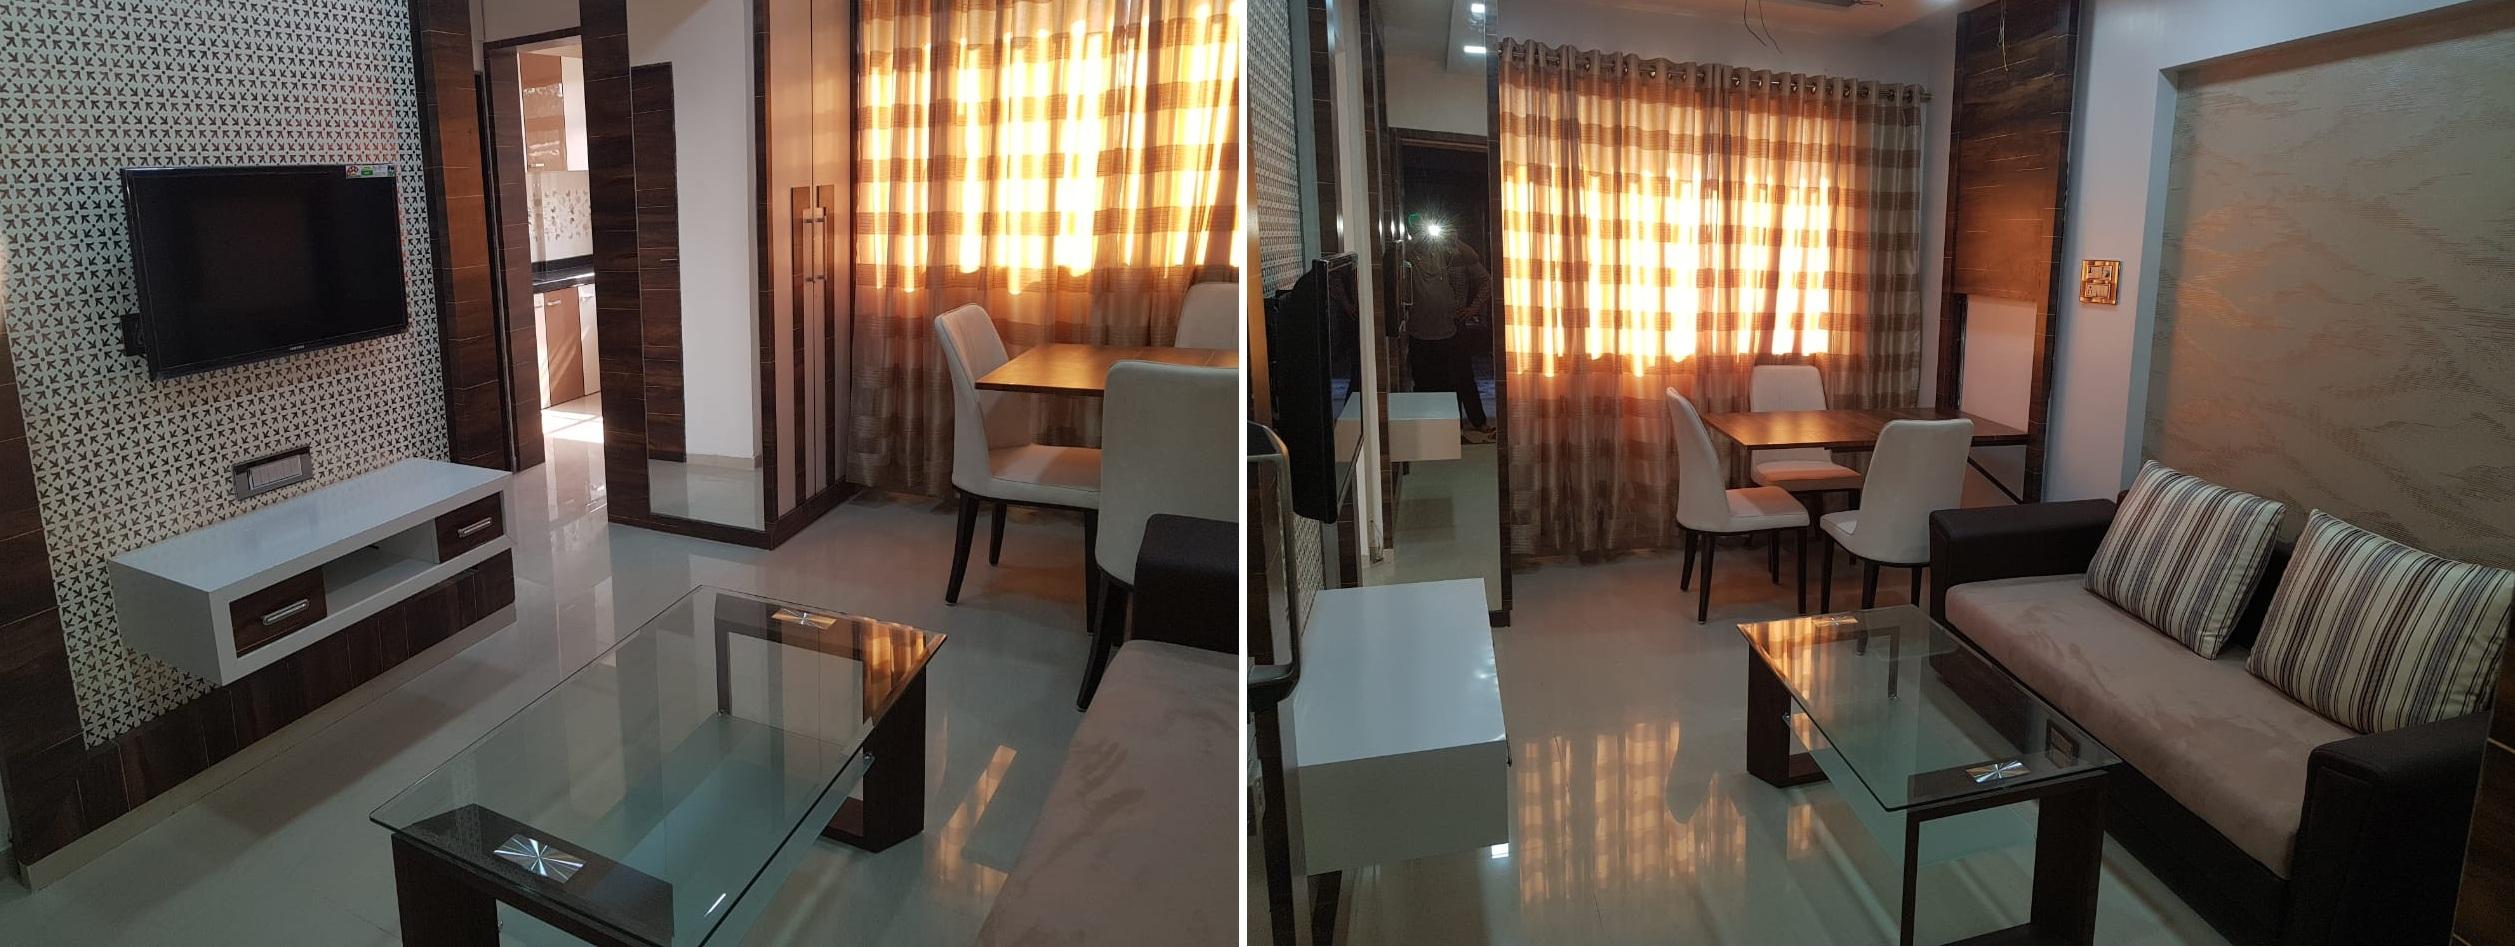 panvelkar utsav phase 1 apartment interiors6